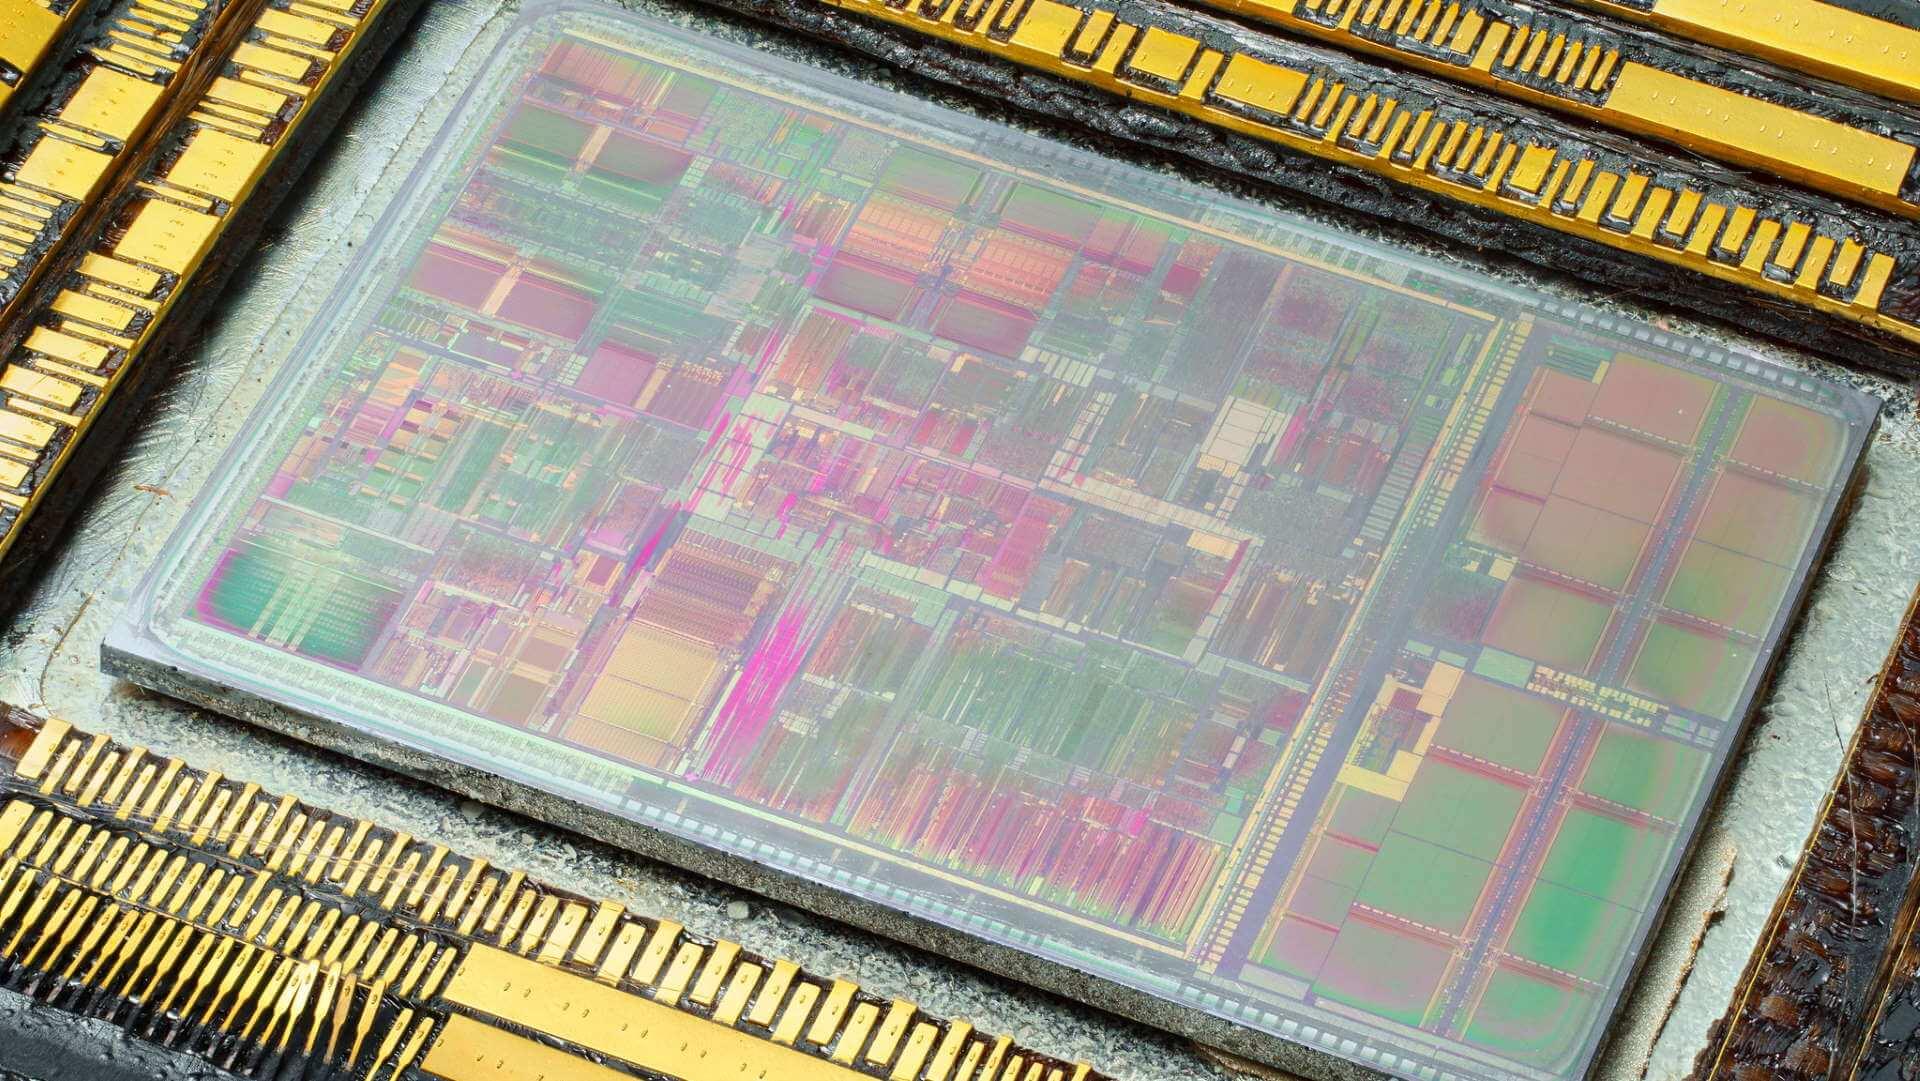 Intel CPU Architecture